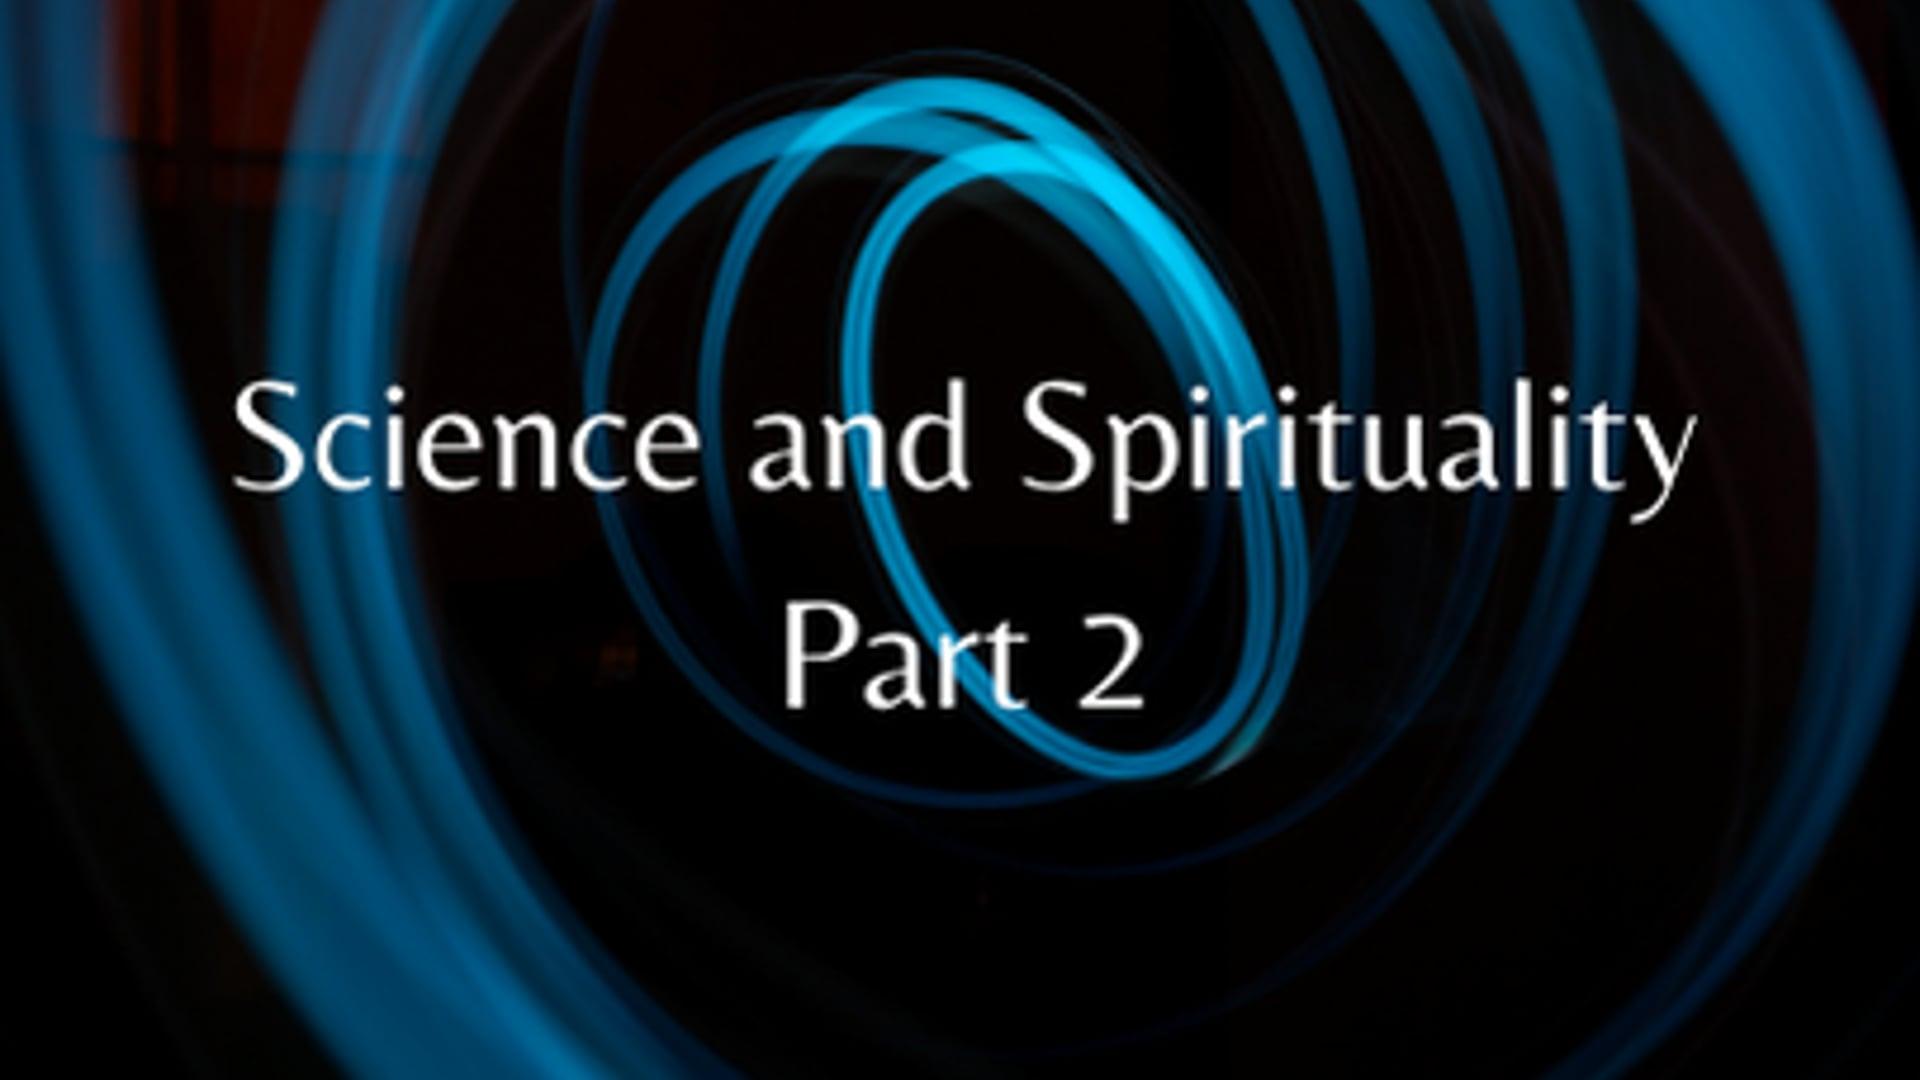 Science & Spirituality Part 2